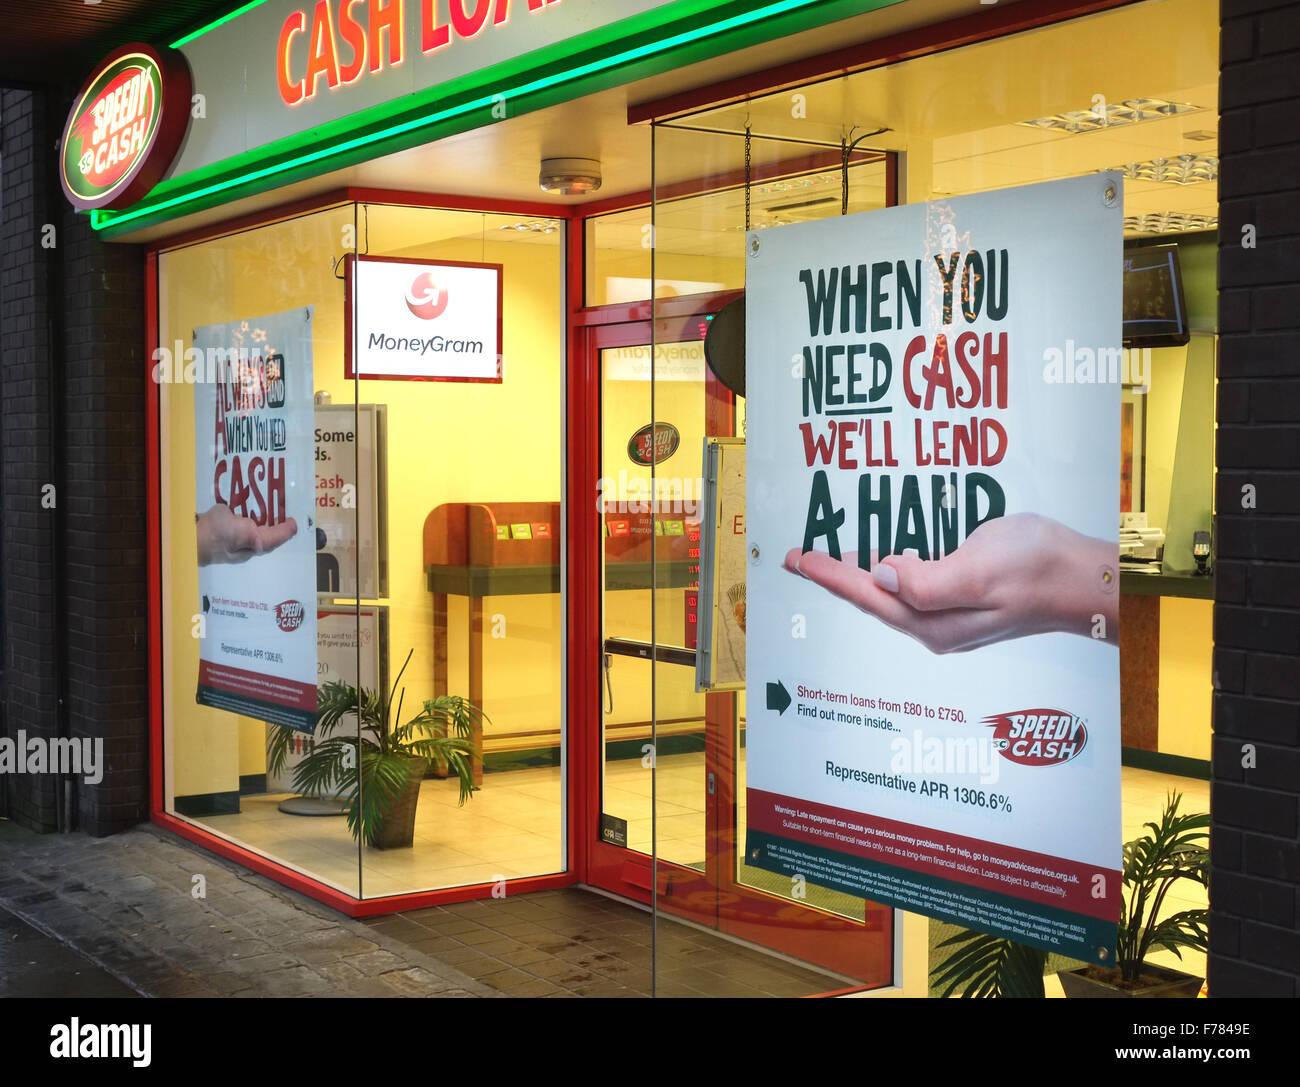 Cash loans in gainesville fl picture 5